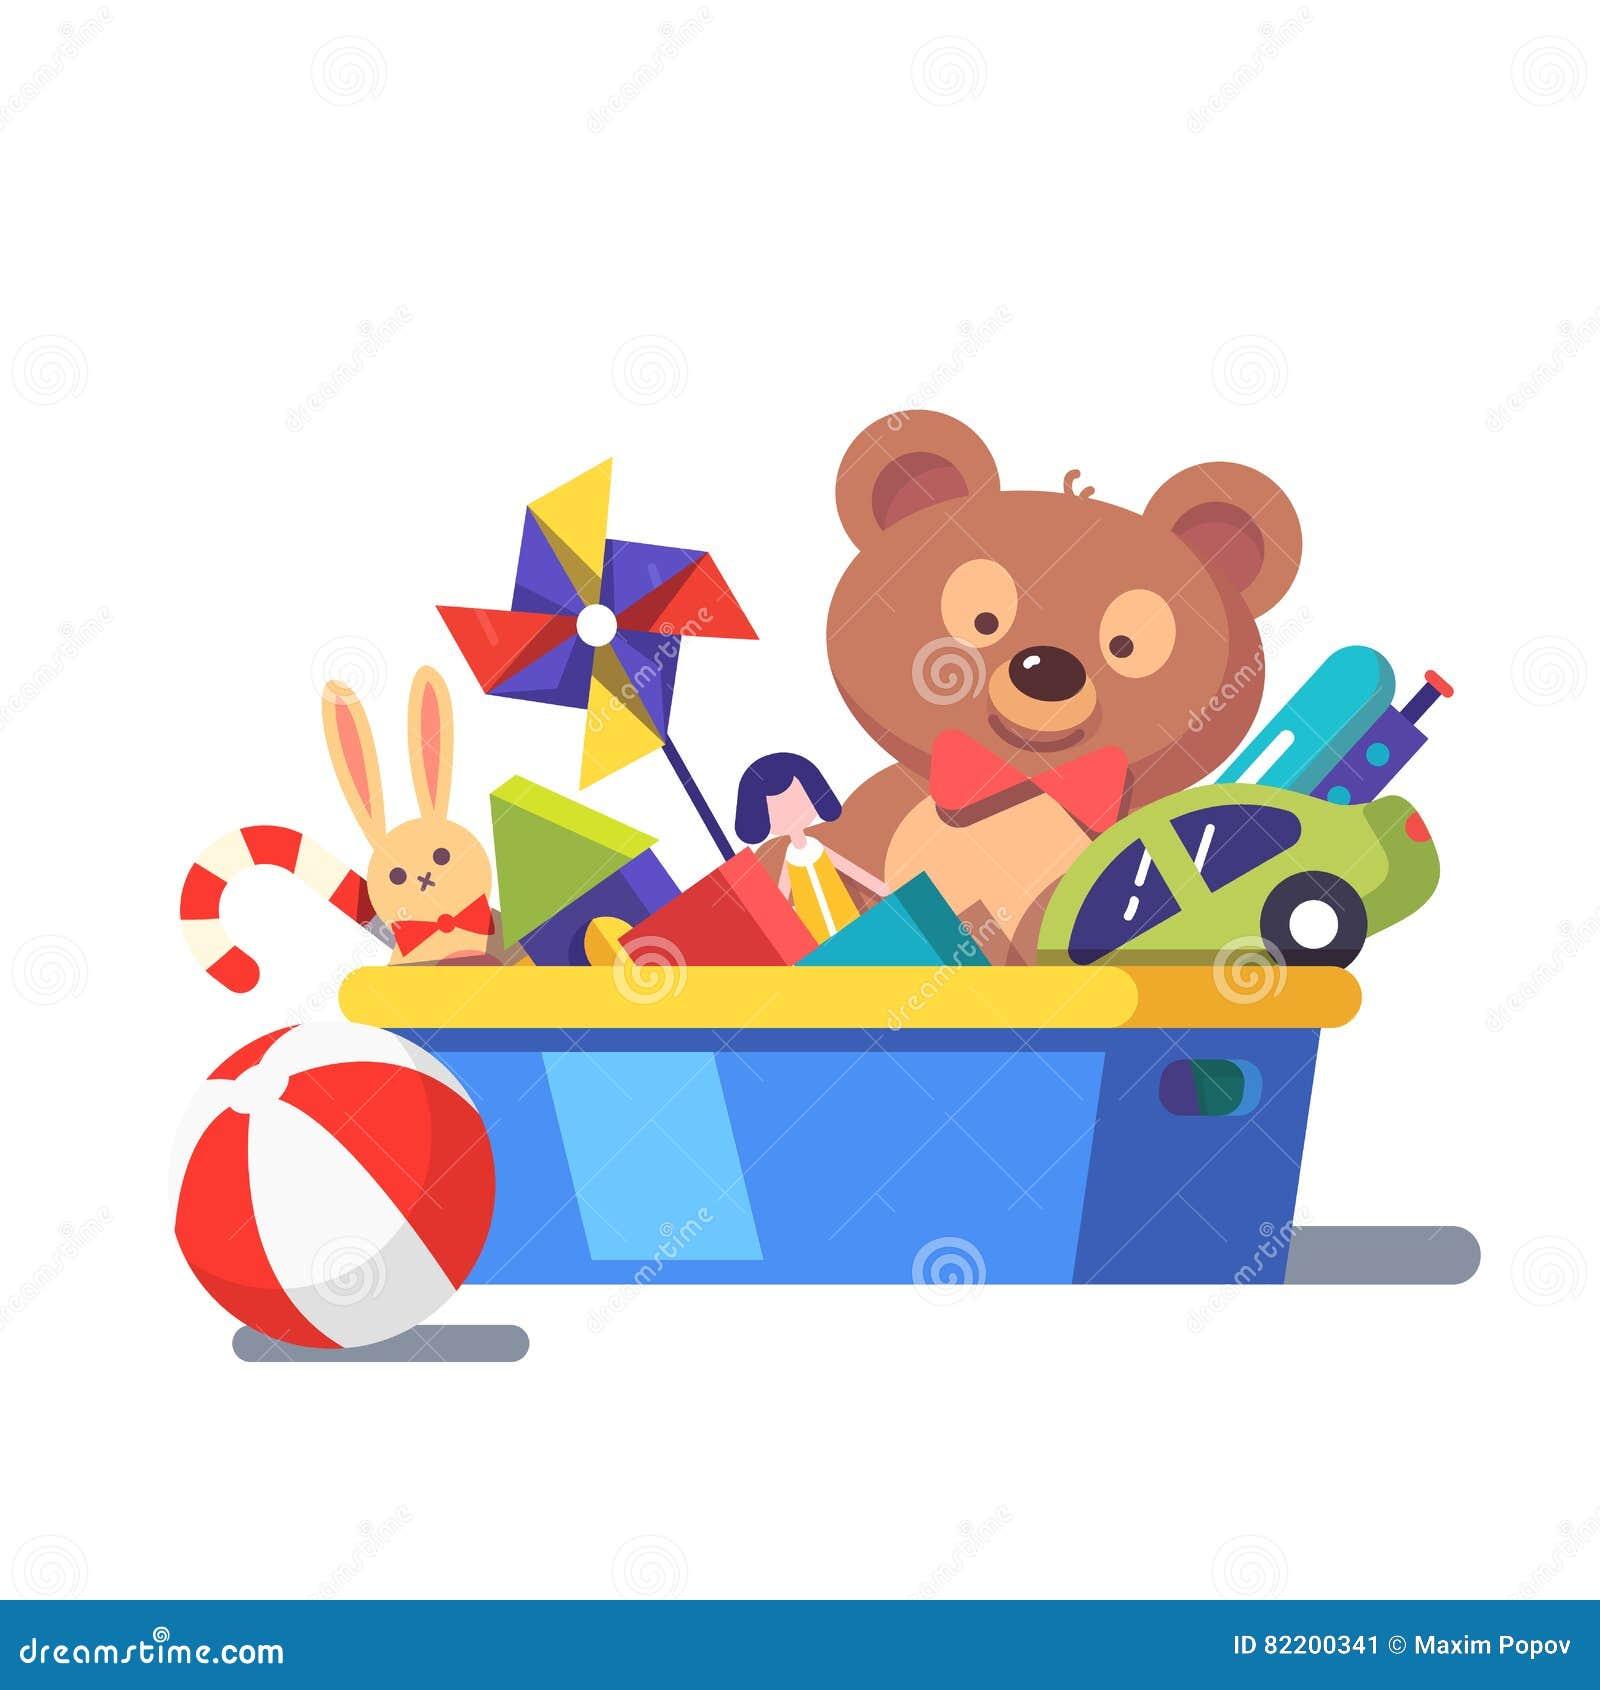 Line Art Cartoon Toys Vector : Kids toy box full of toys stock vector illustration